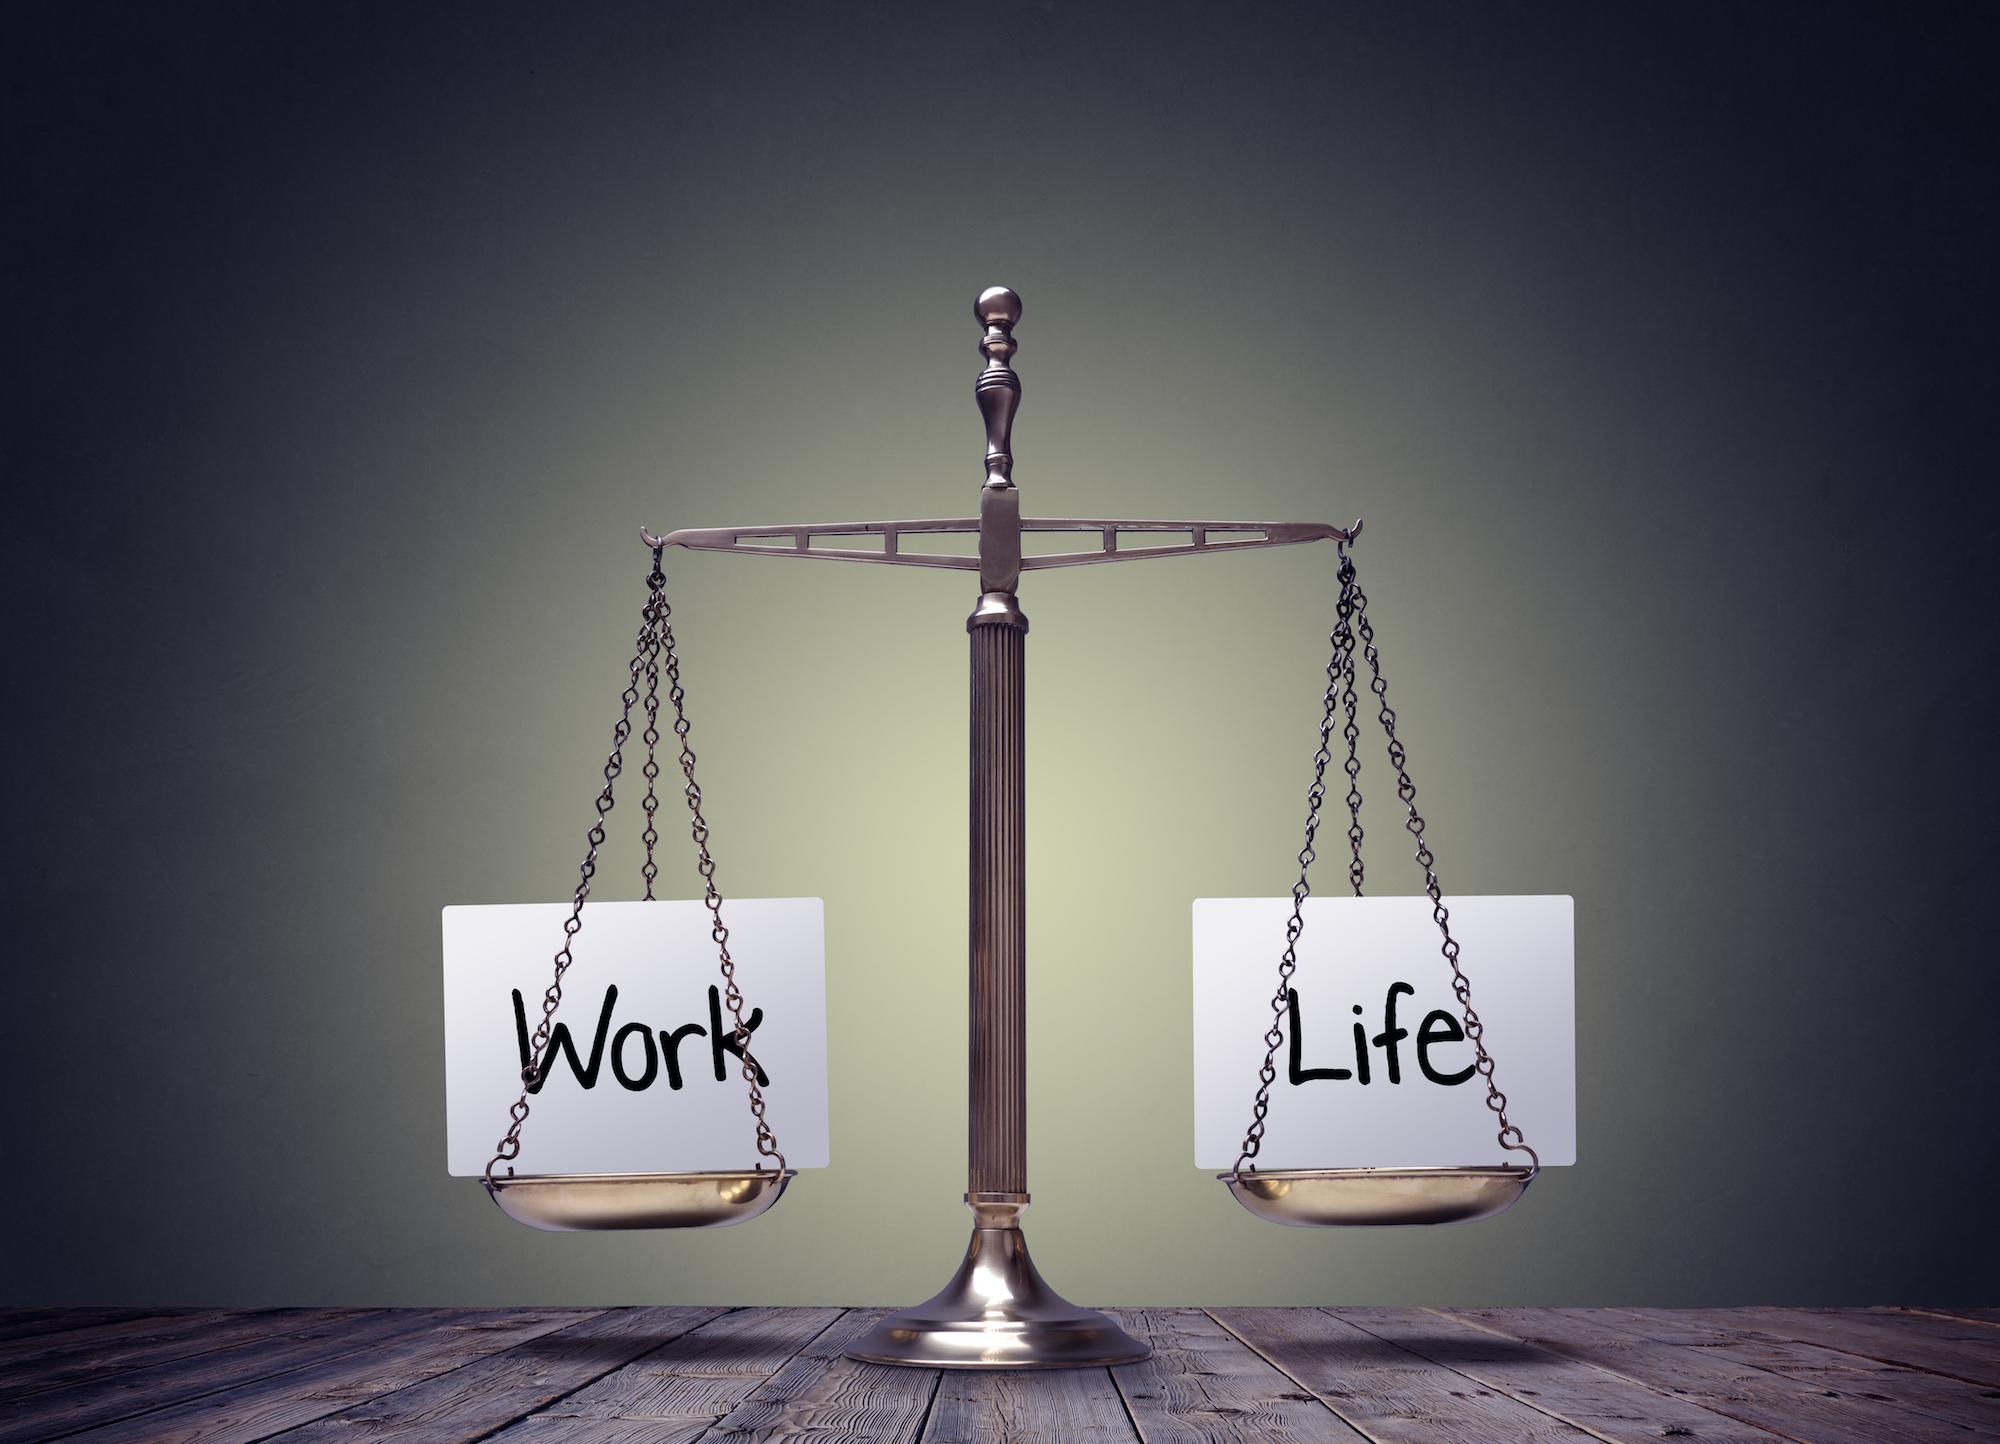 work-life-balance-scales-PJG6A7L.jpg